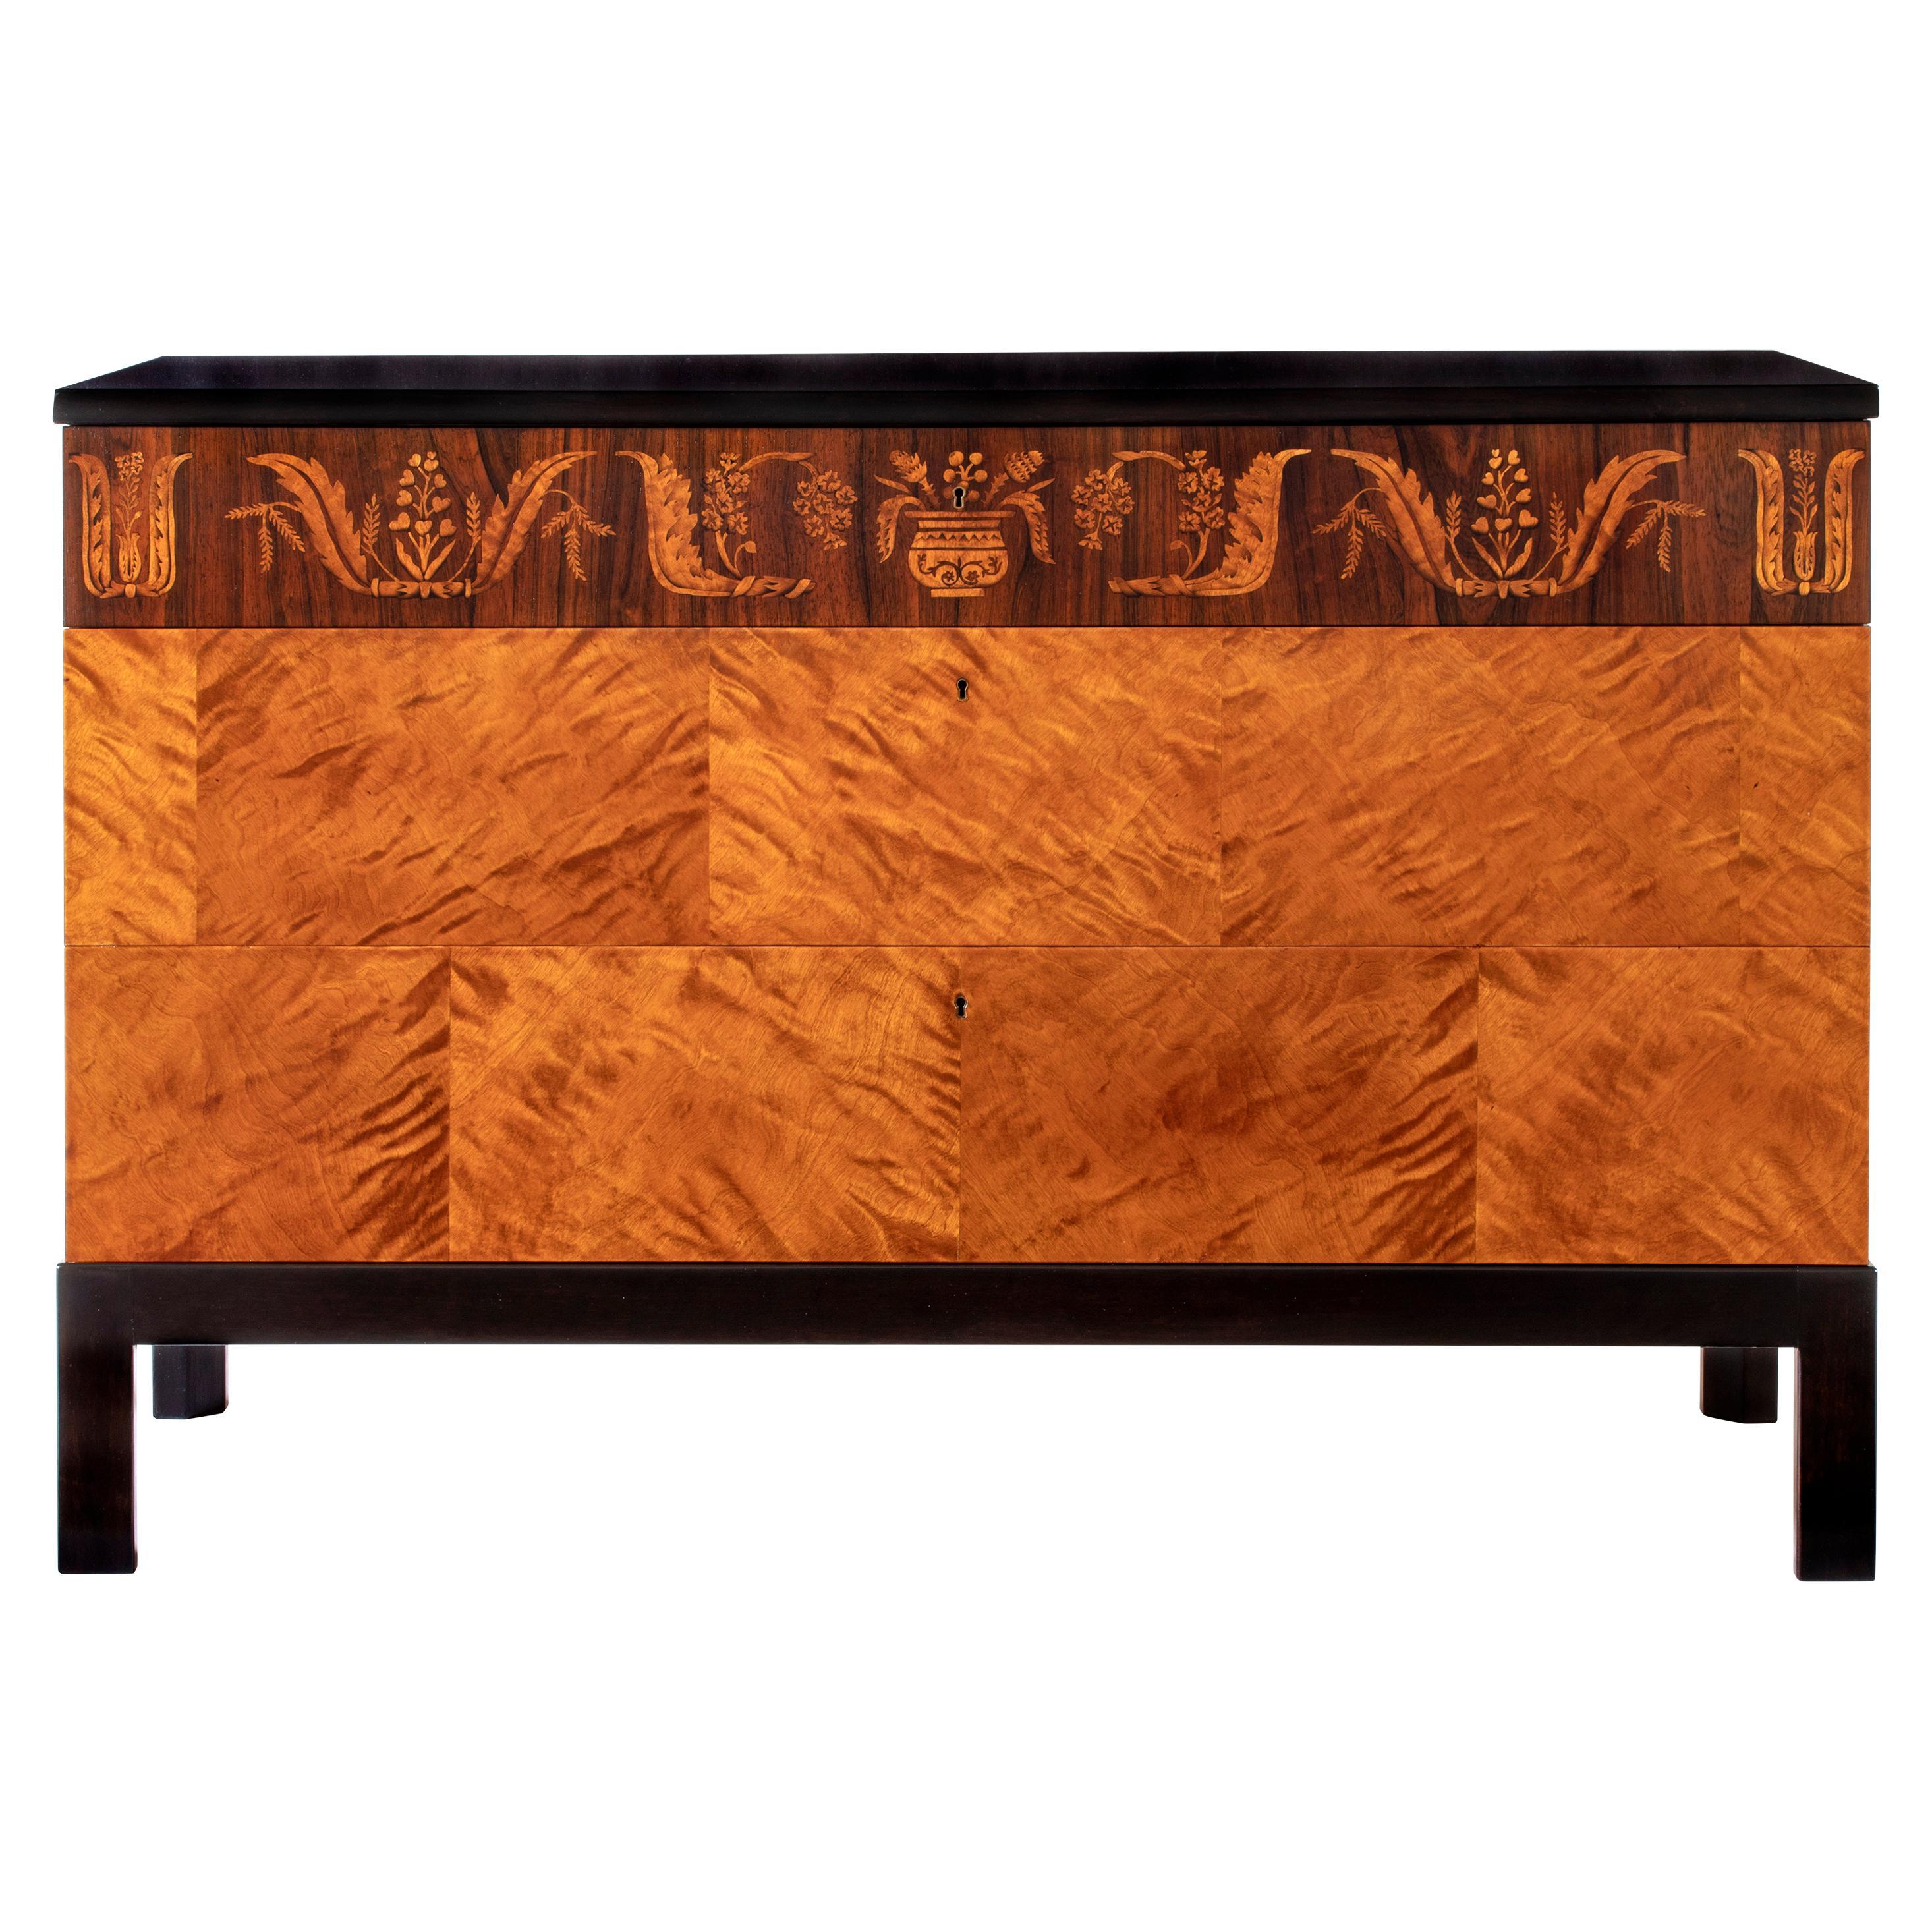 Carl Malmsten, Swedish Grace Period Flame Birch & Rosewood Three-Drawer Commode